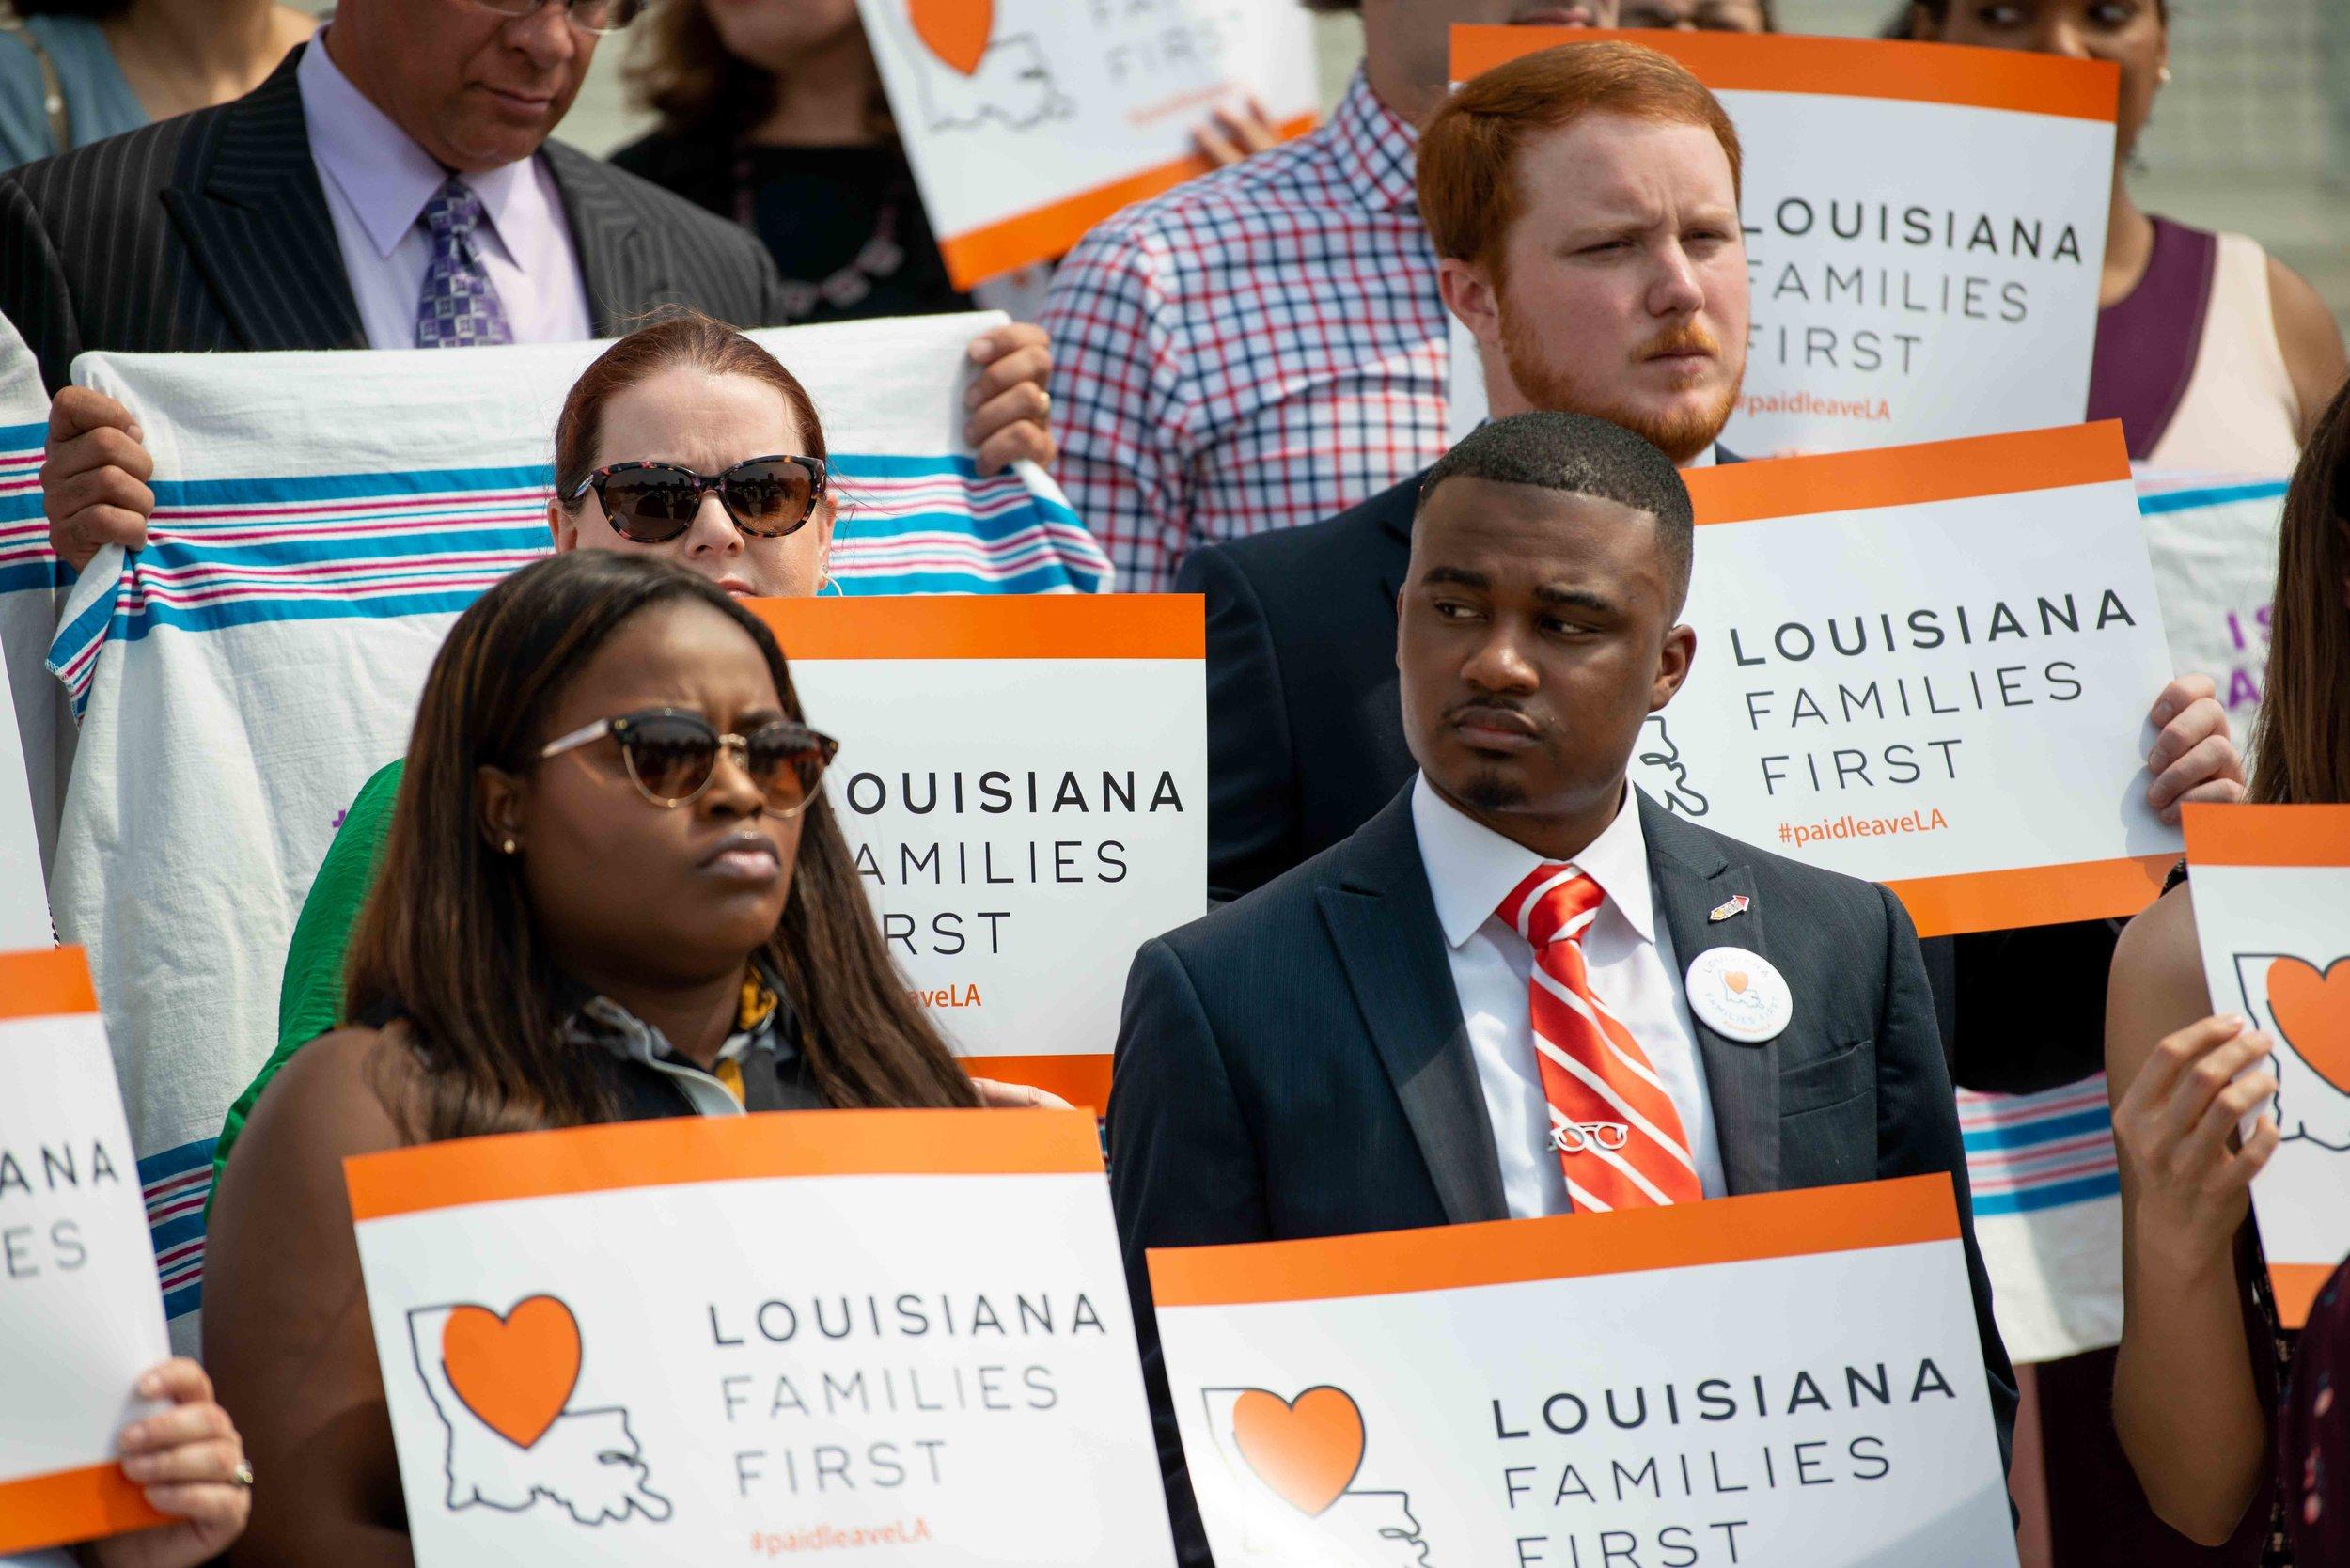 Louisiana Families First-8.jpg